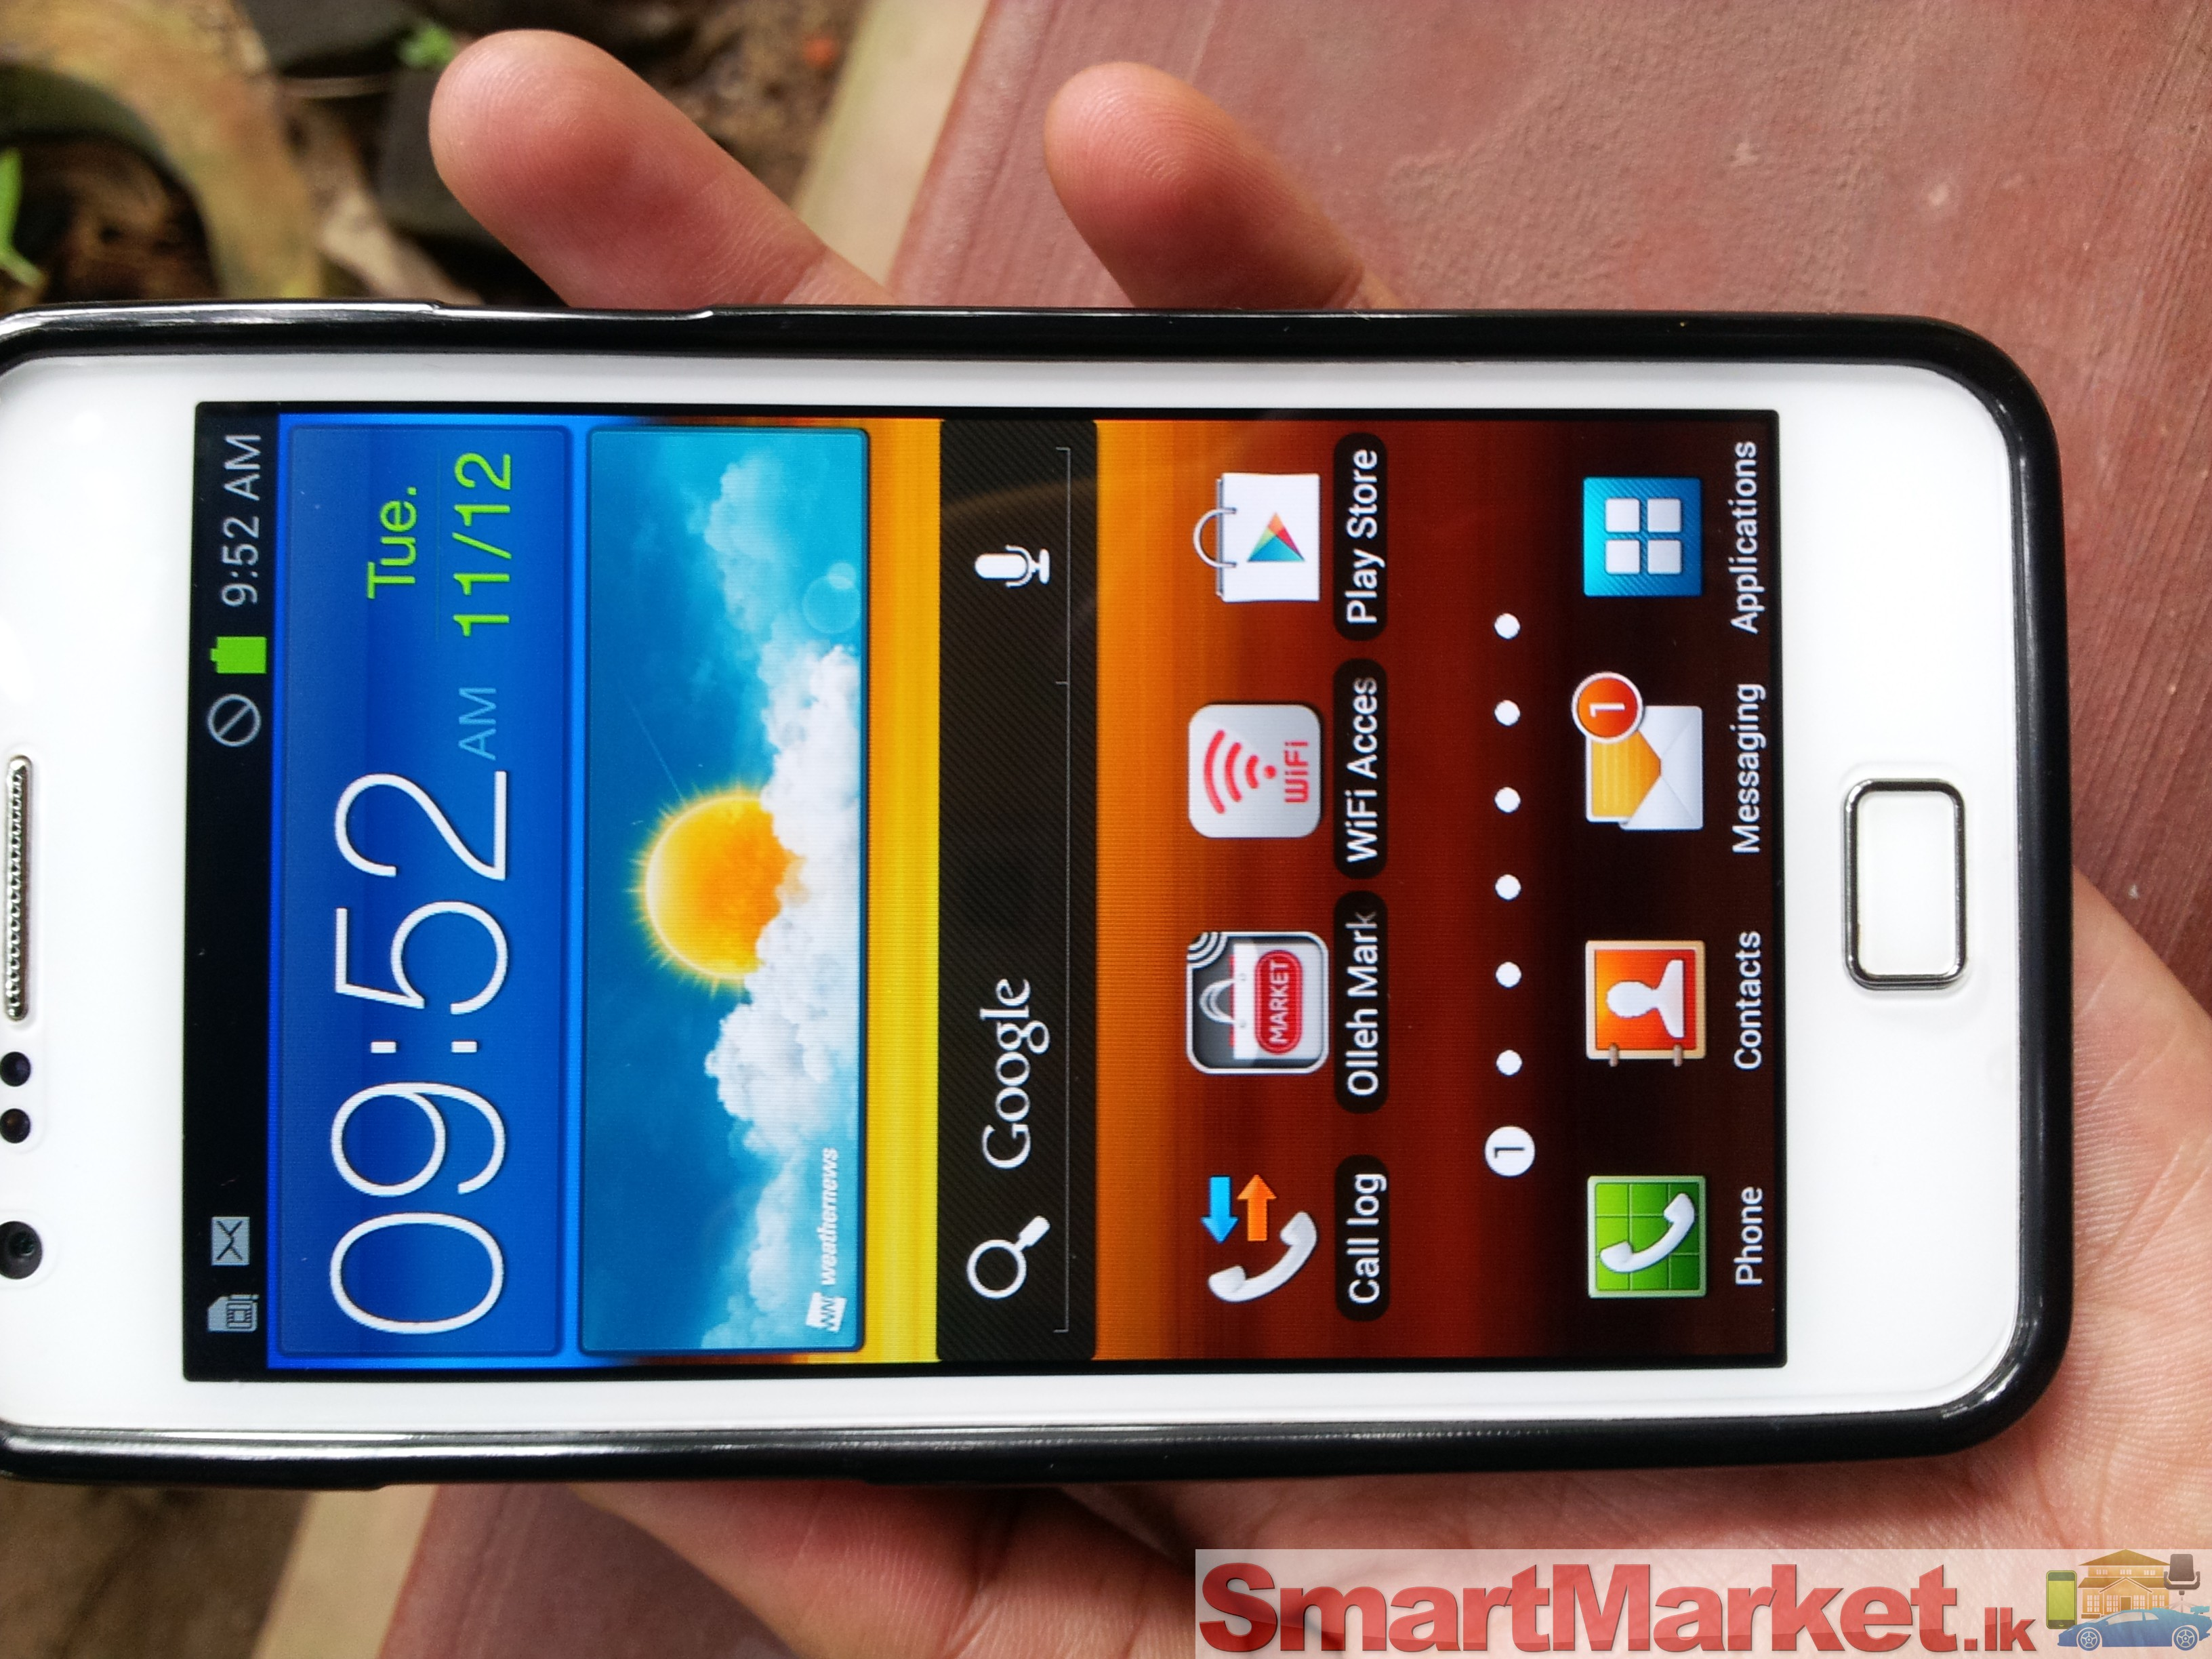 Samsung galaxy SII shw - m250k For Sale in Kurunegala   Smartmarket lk